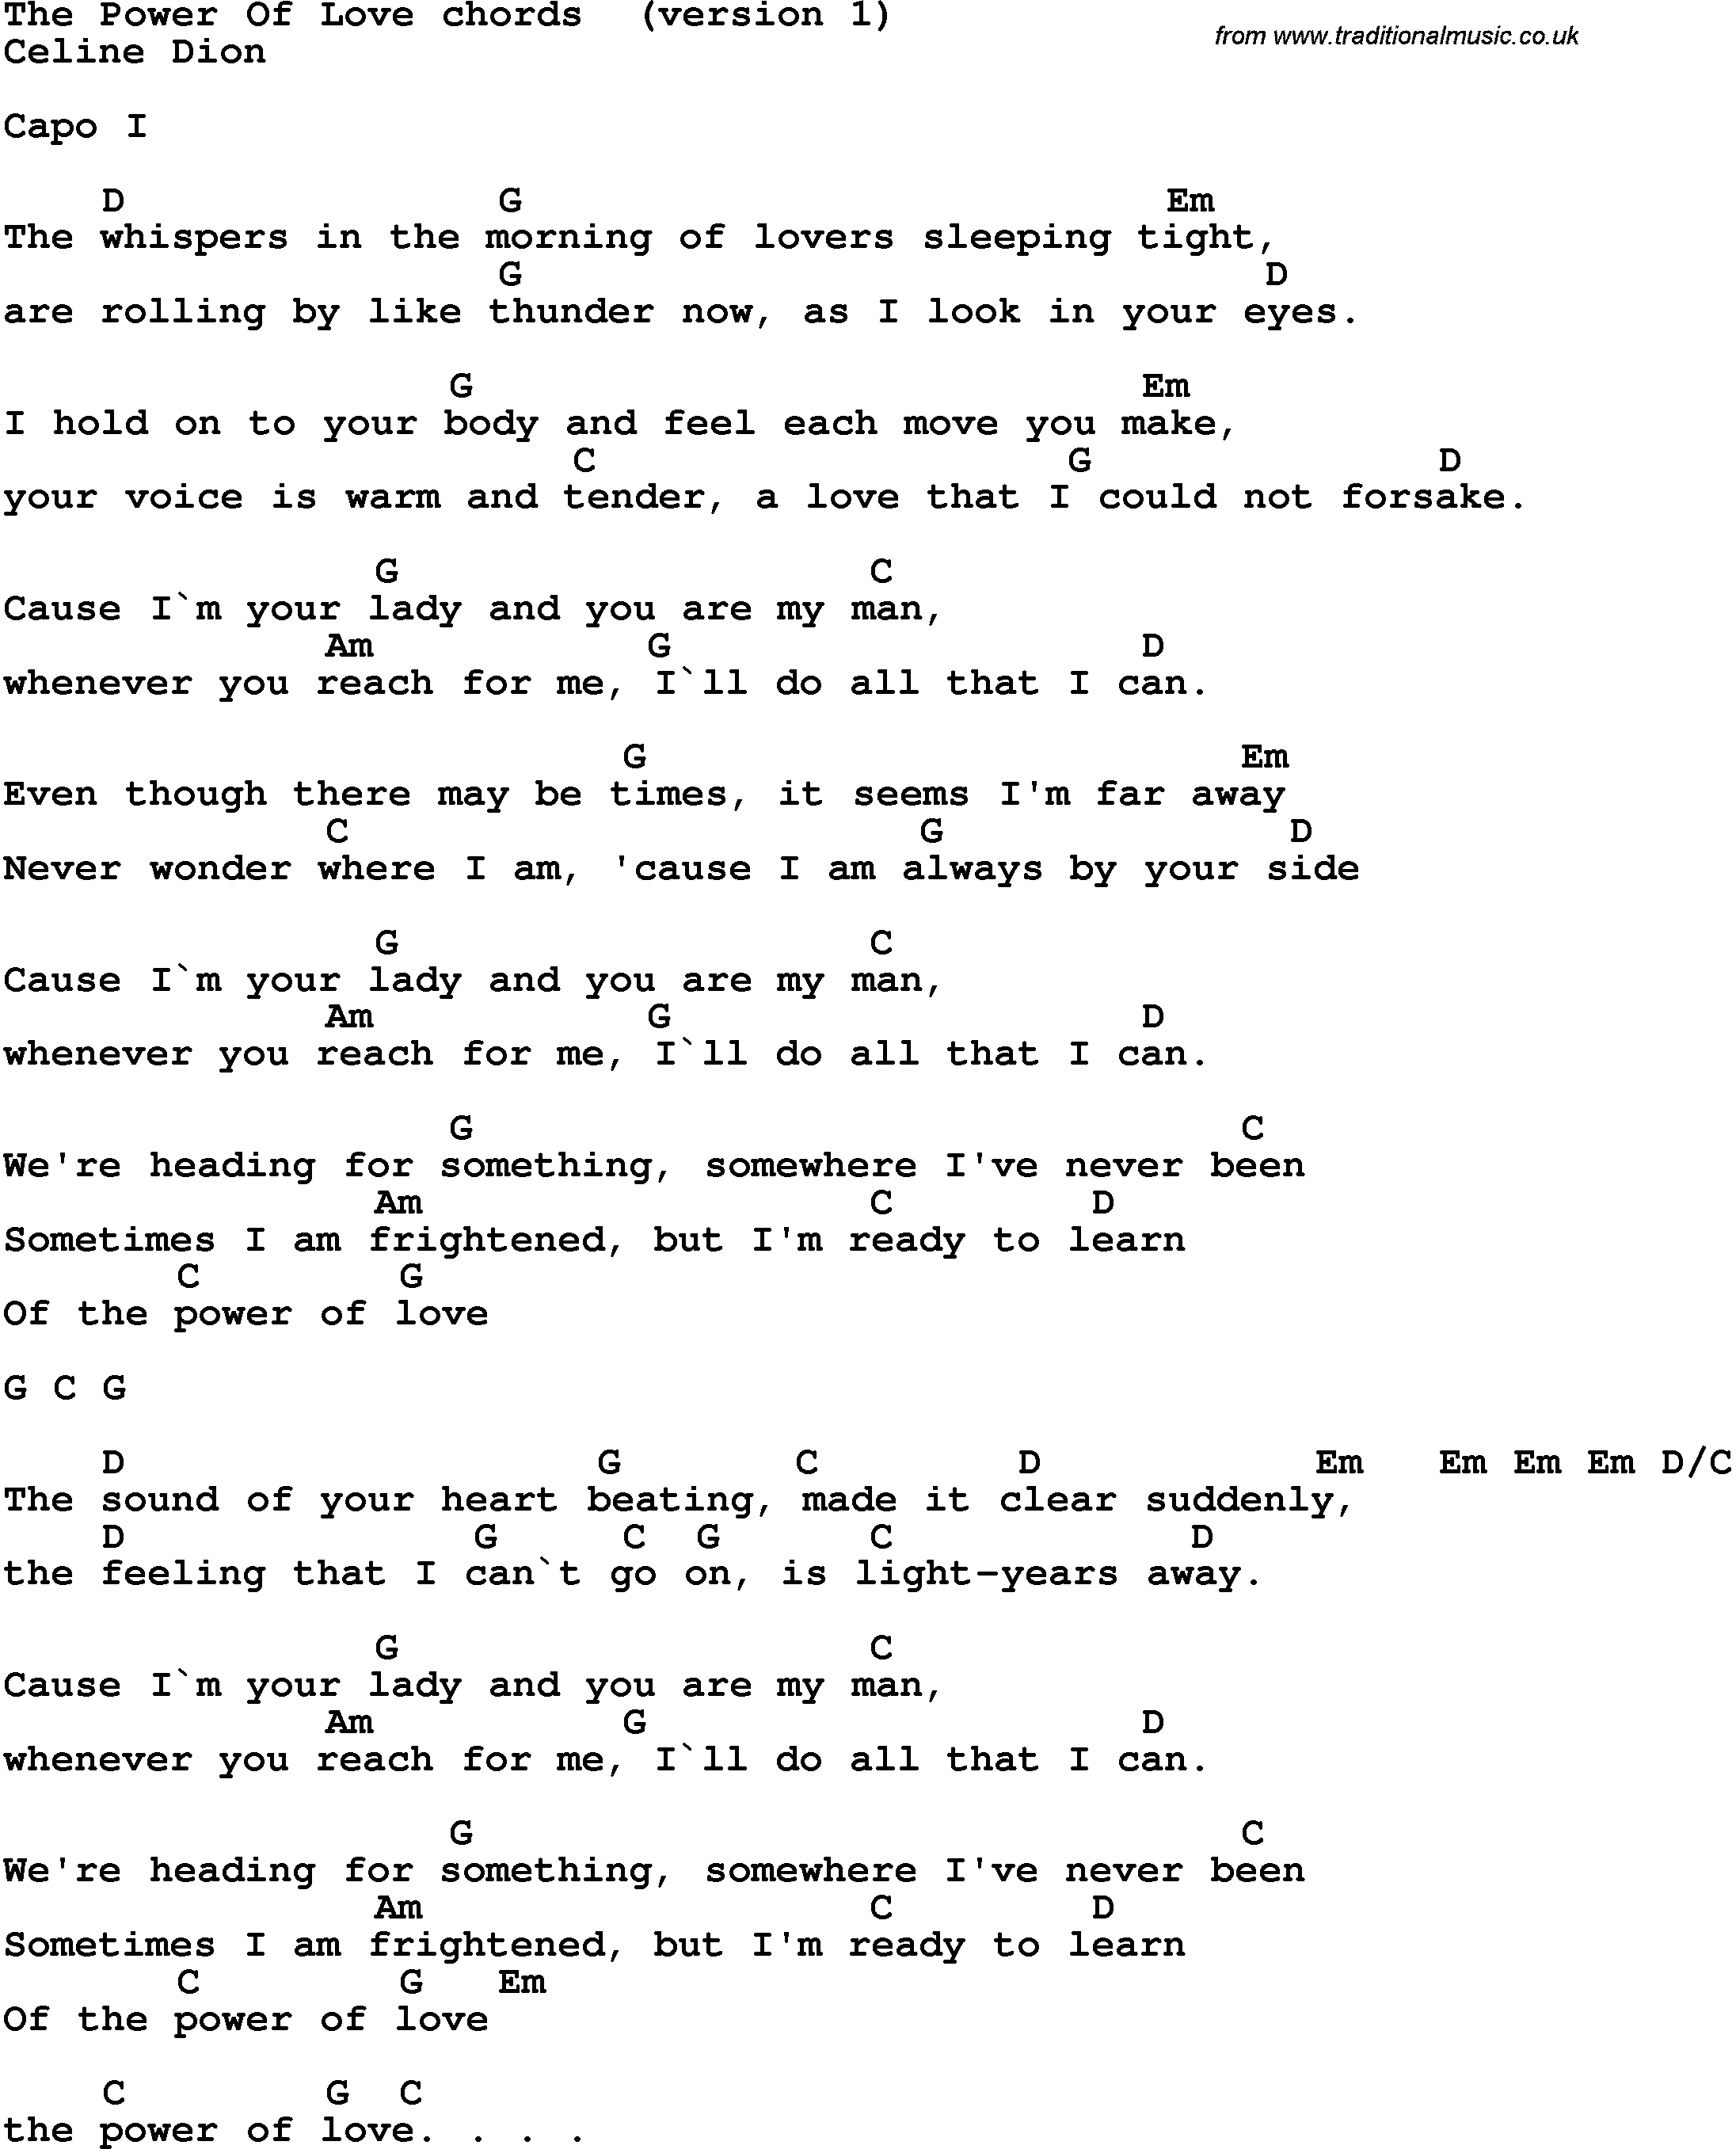 Lirik Lagu Power of Love